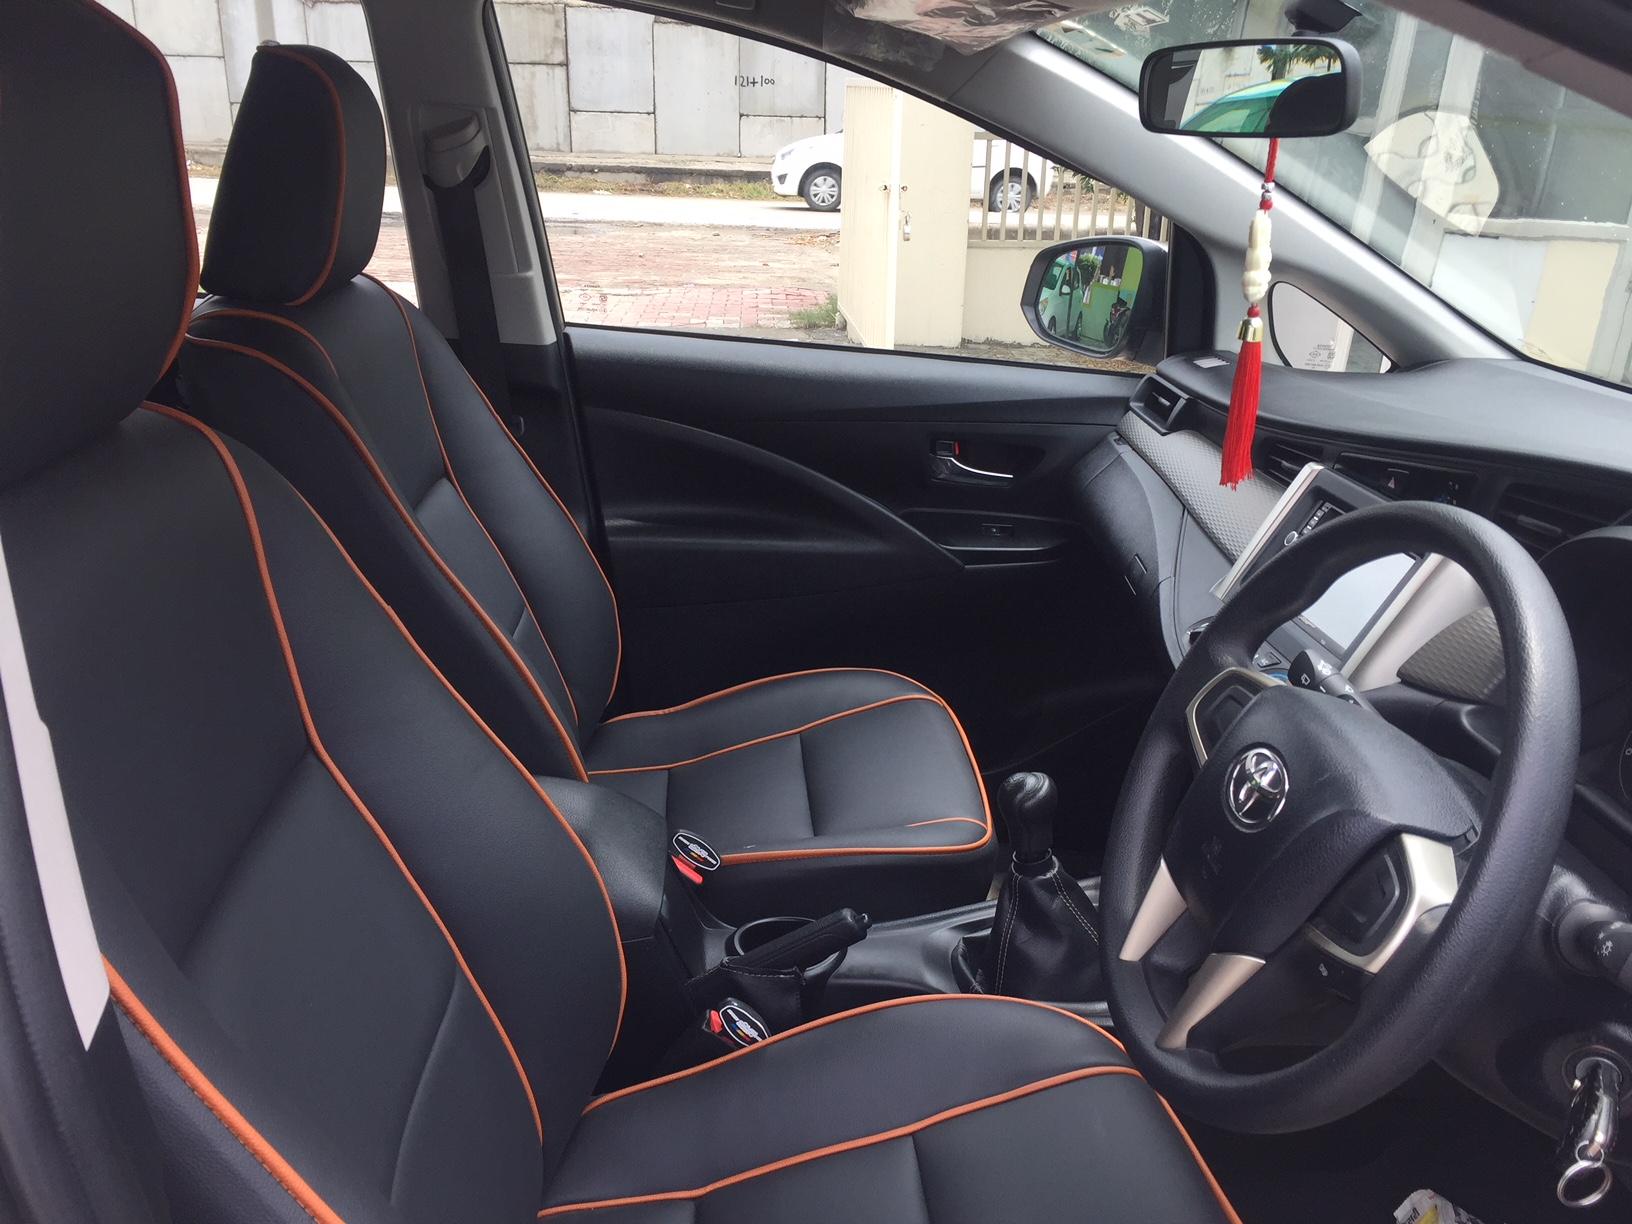 2017 Used Toyota Innova Crysta 2.4 G 7 STR